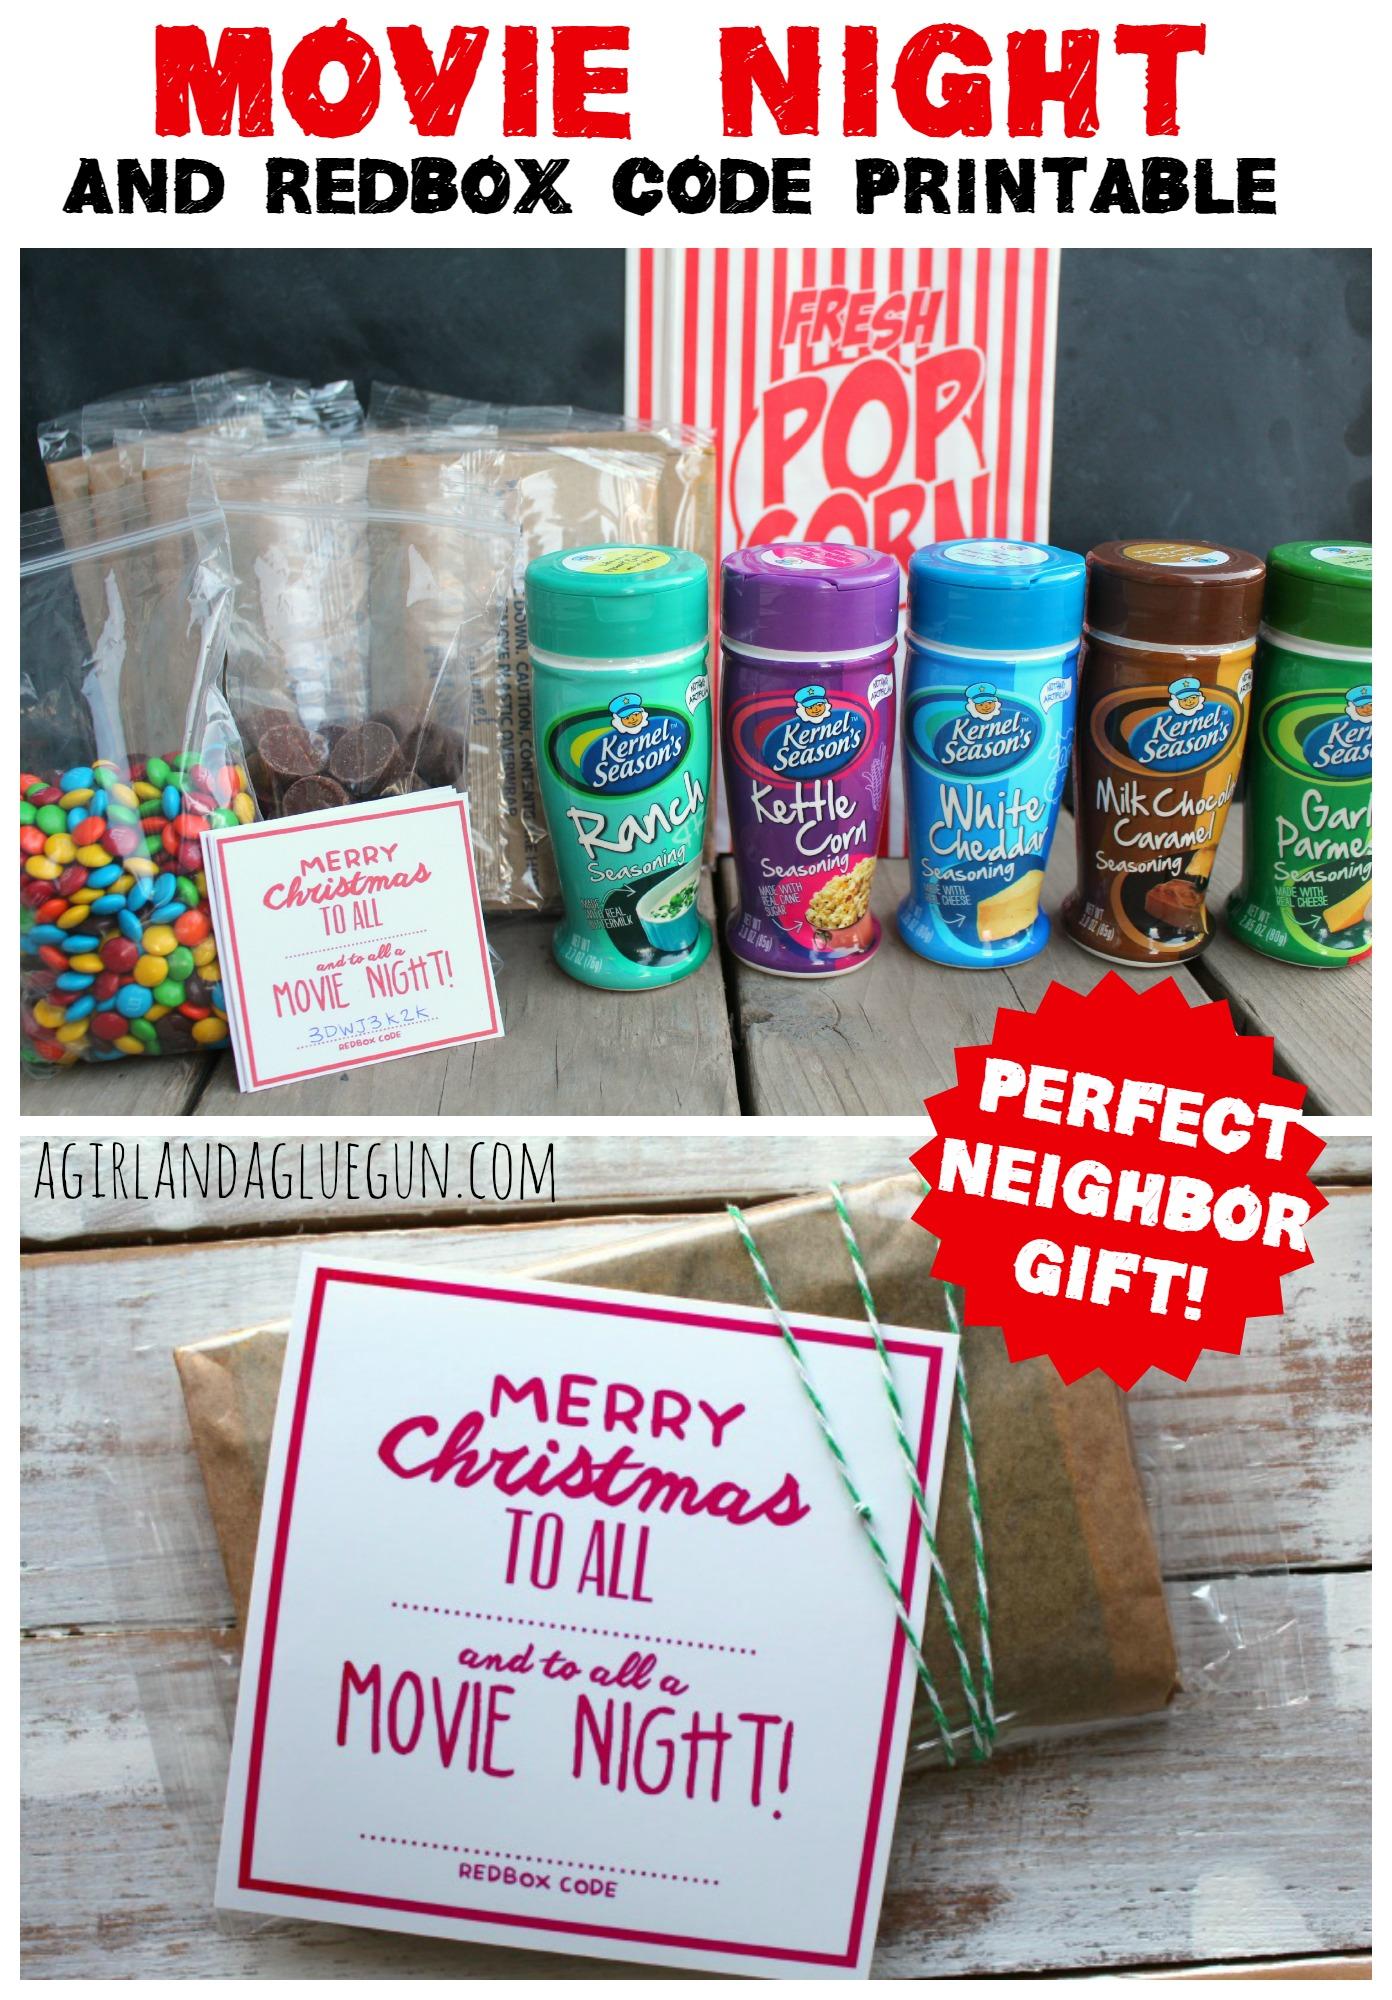 Neighbor Christmas Gift Ideas | Movie Night Gift Idea | A Girl and a Glue Gun